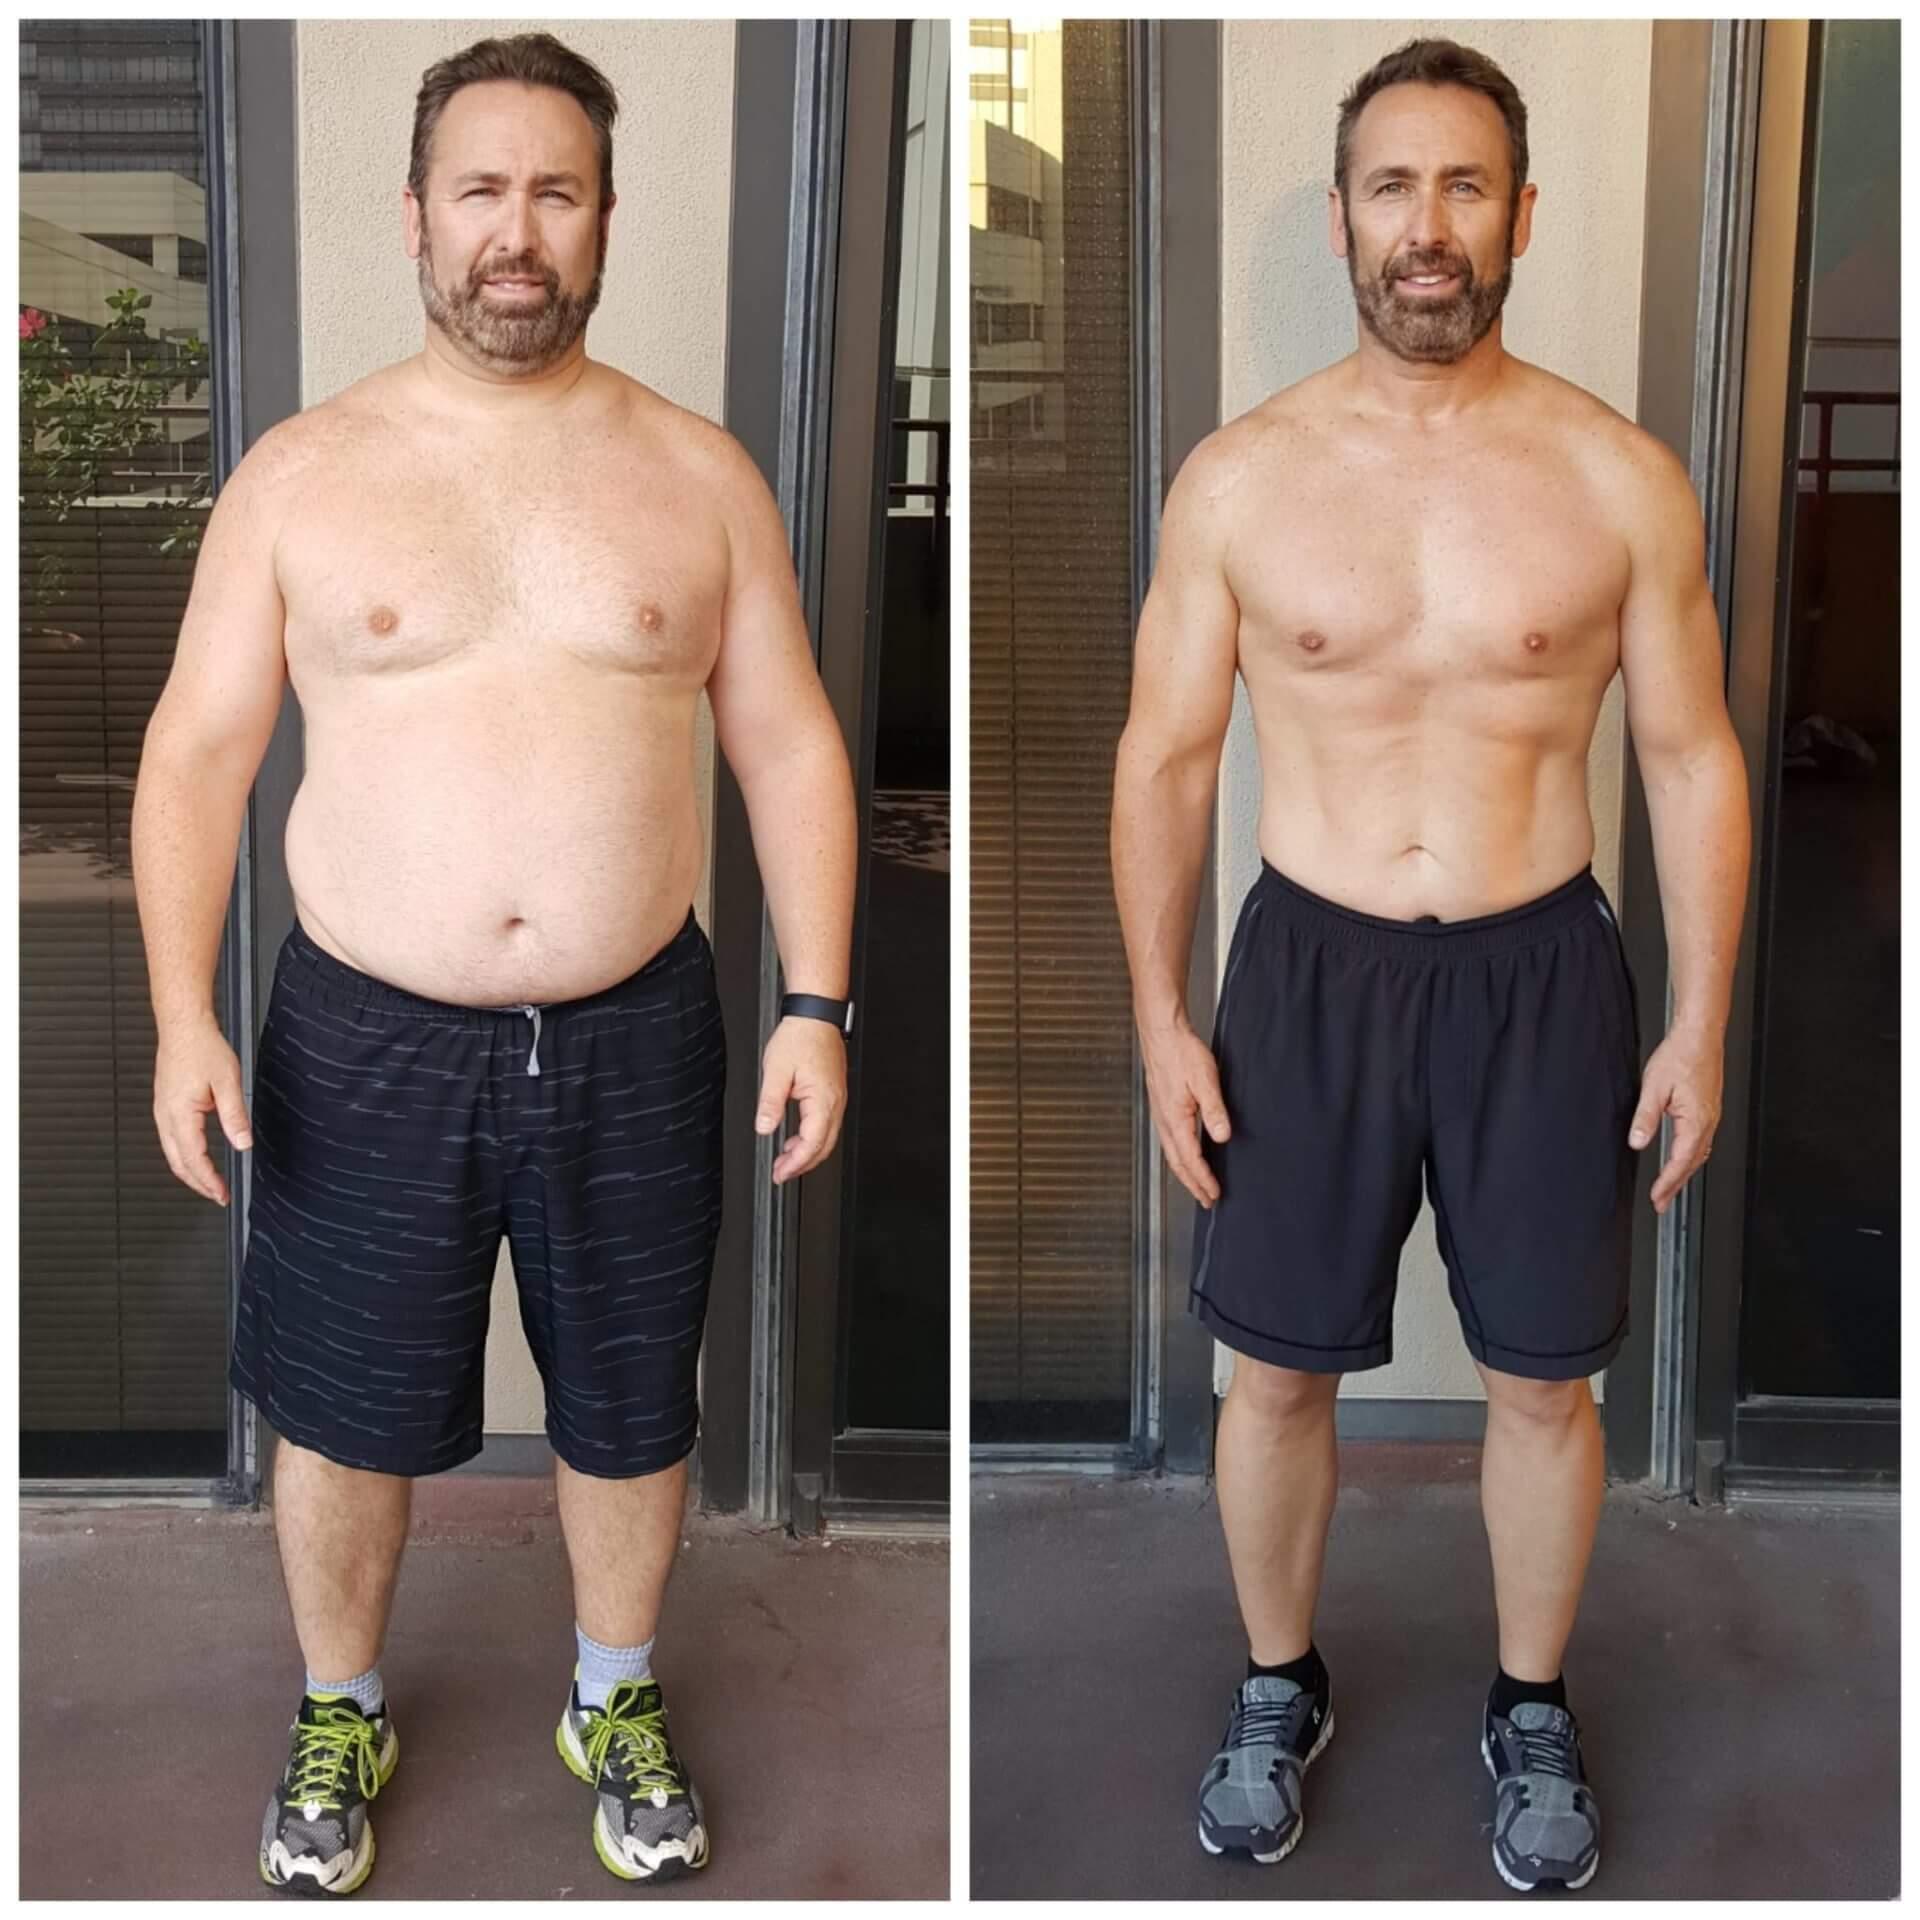 Brian weight loss personal trainer Dallas